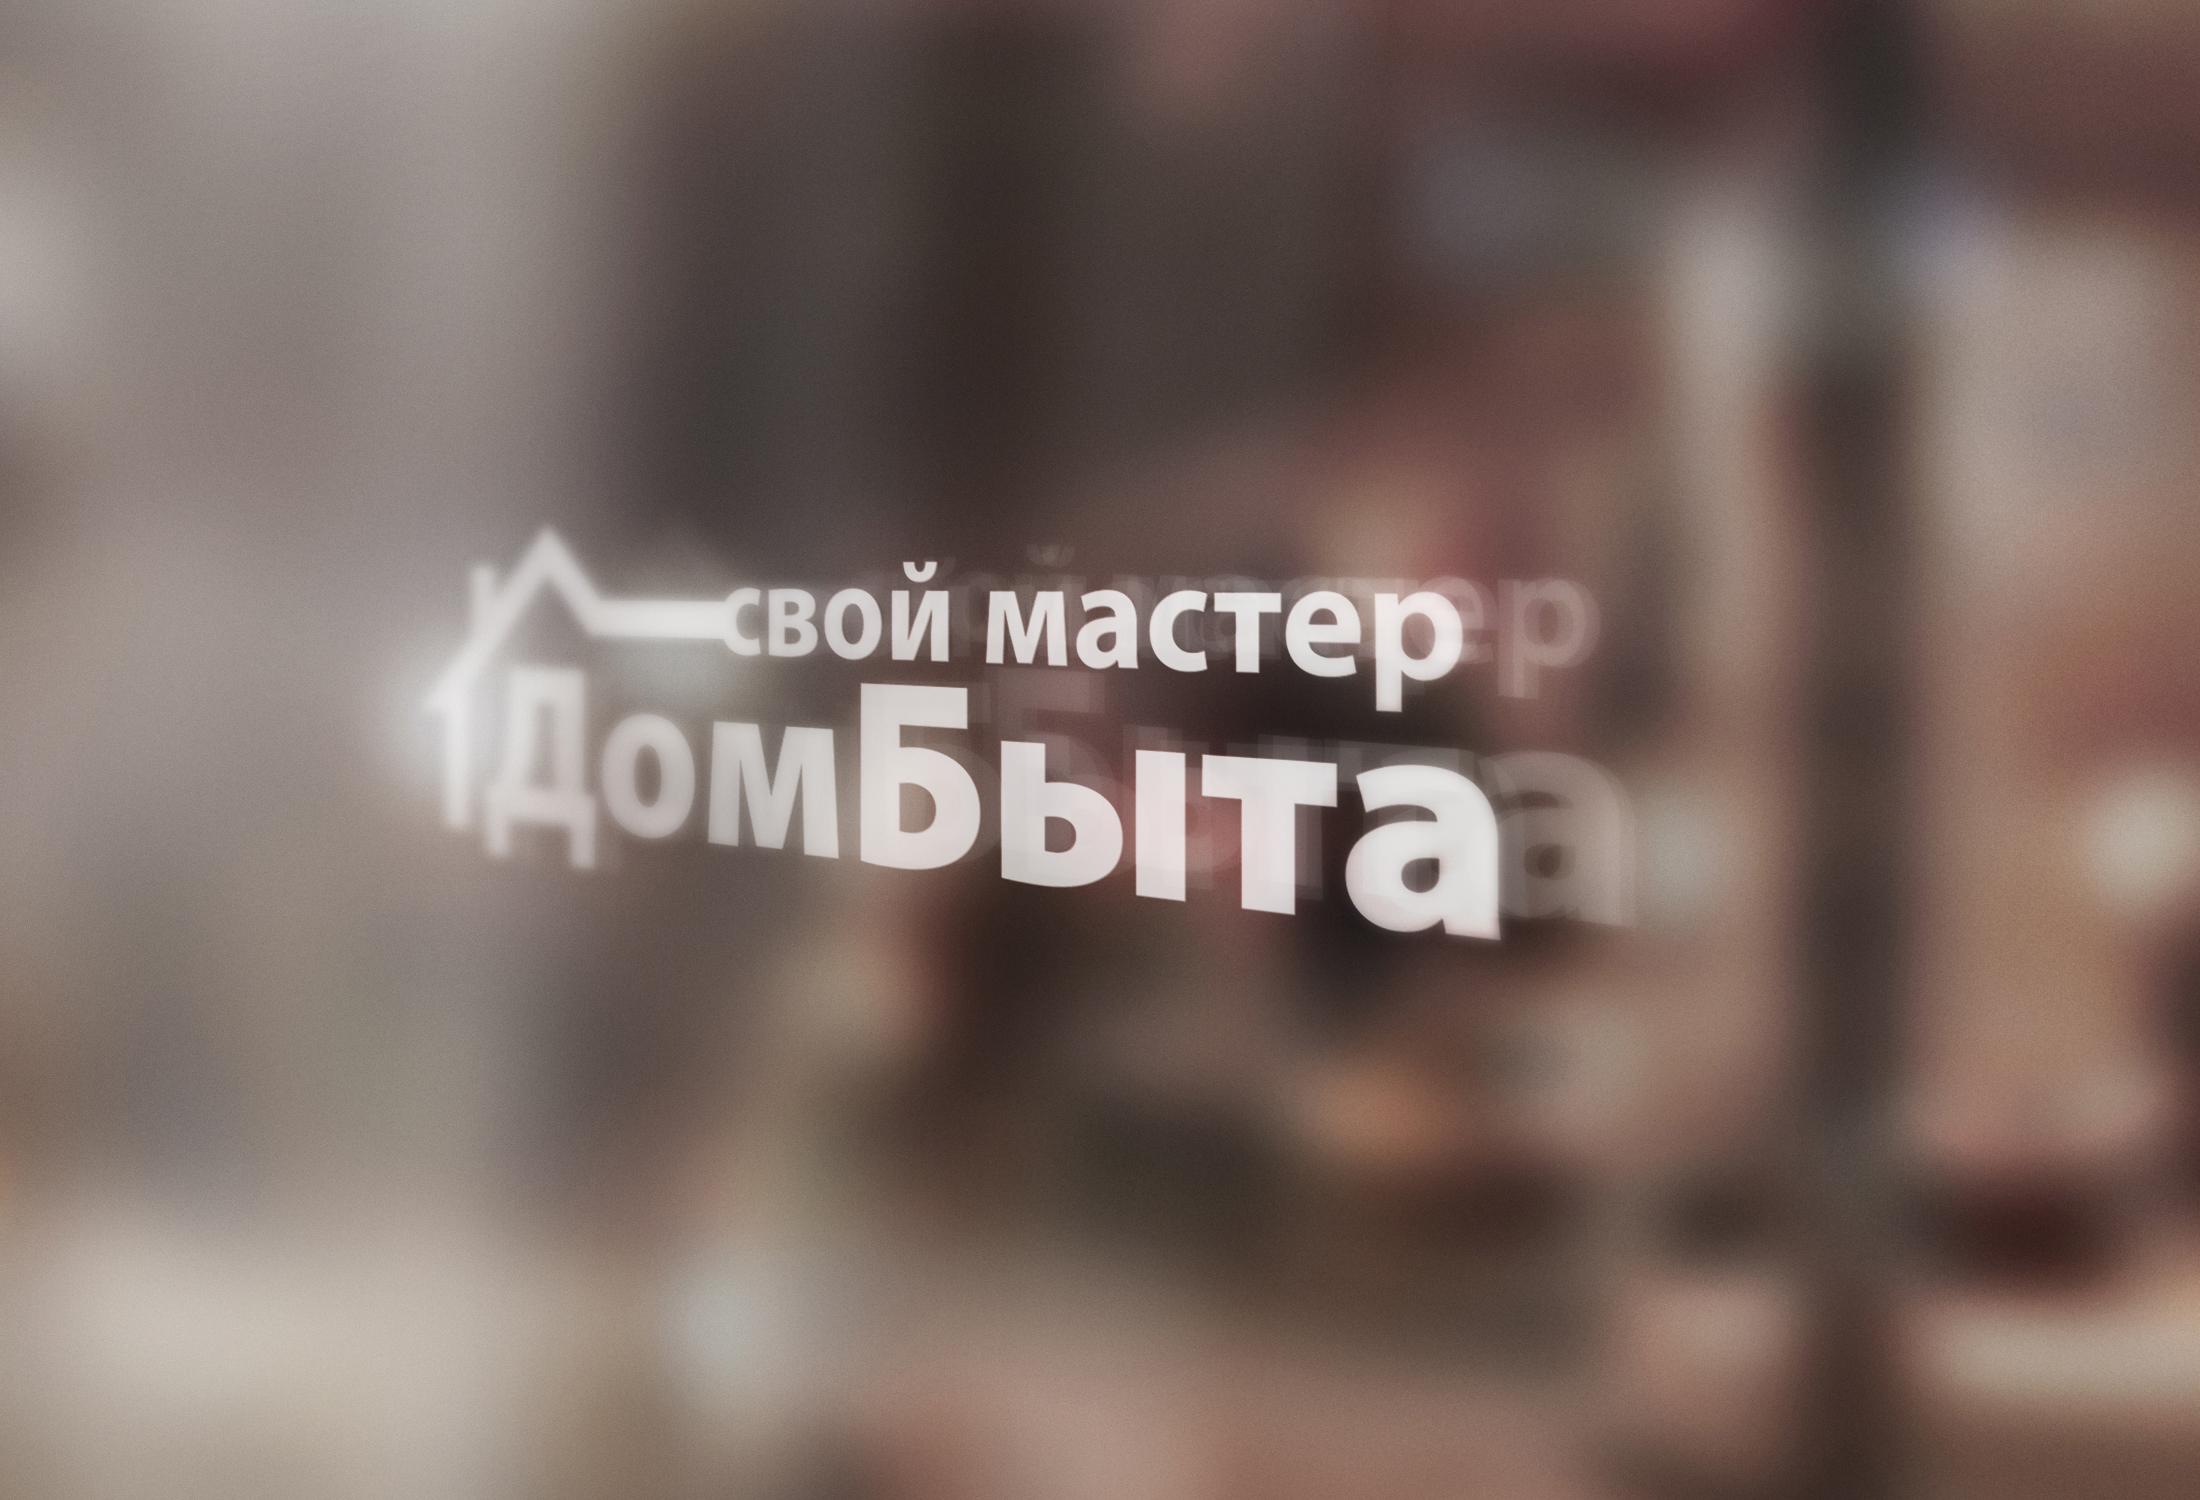 Логотип для сетевого ДОМ БЫТА фото f_6035d7ab5743e3ce.jpg